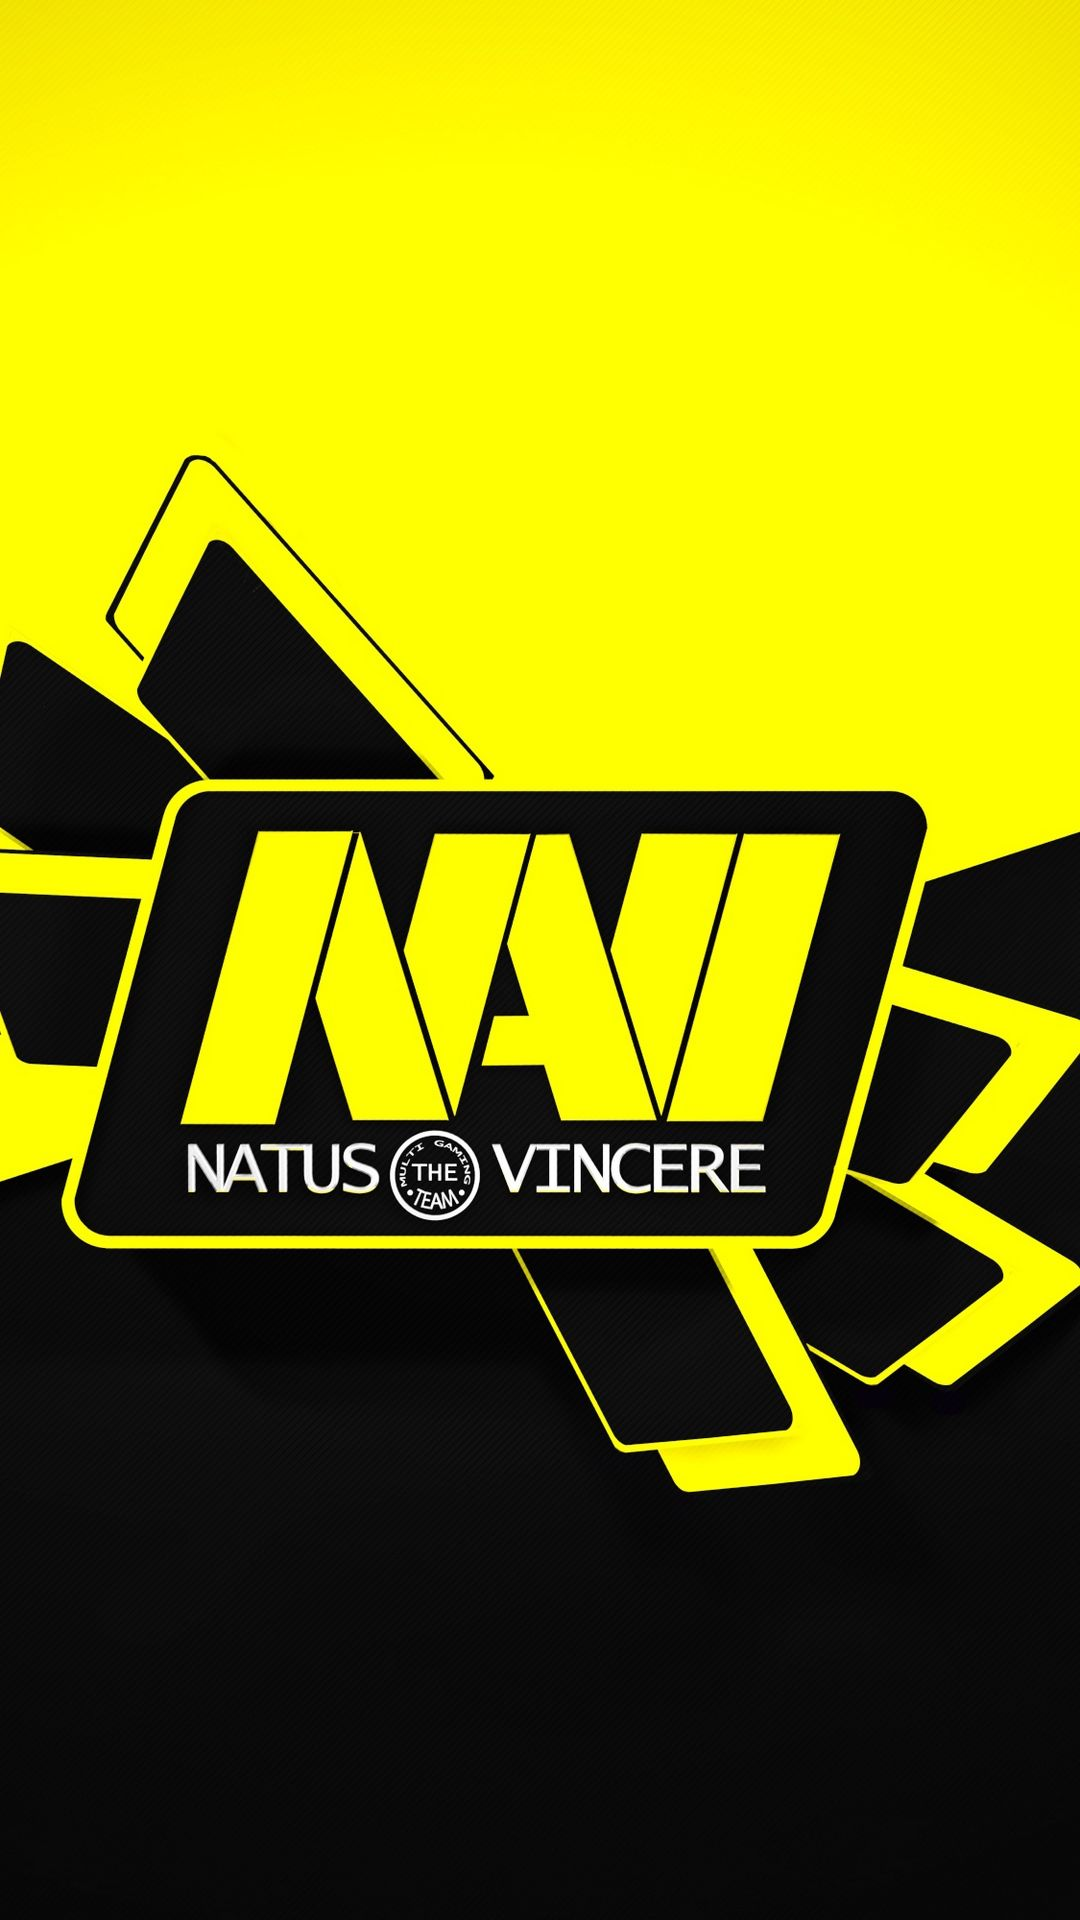 Krass Natus Vincere Navi Games Wallpaper Lockscreen Mobile Android Ios Infinitywallpaper Wallpaper Gaming Wallpapers Iphone Wallpaper